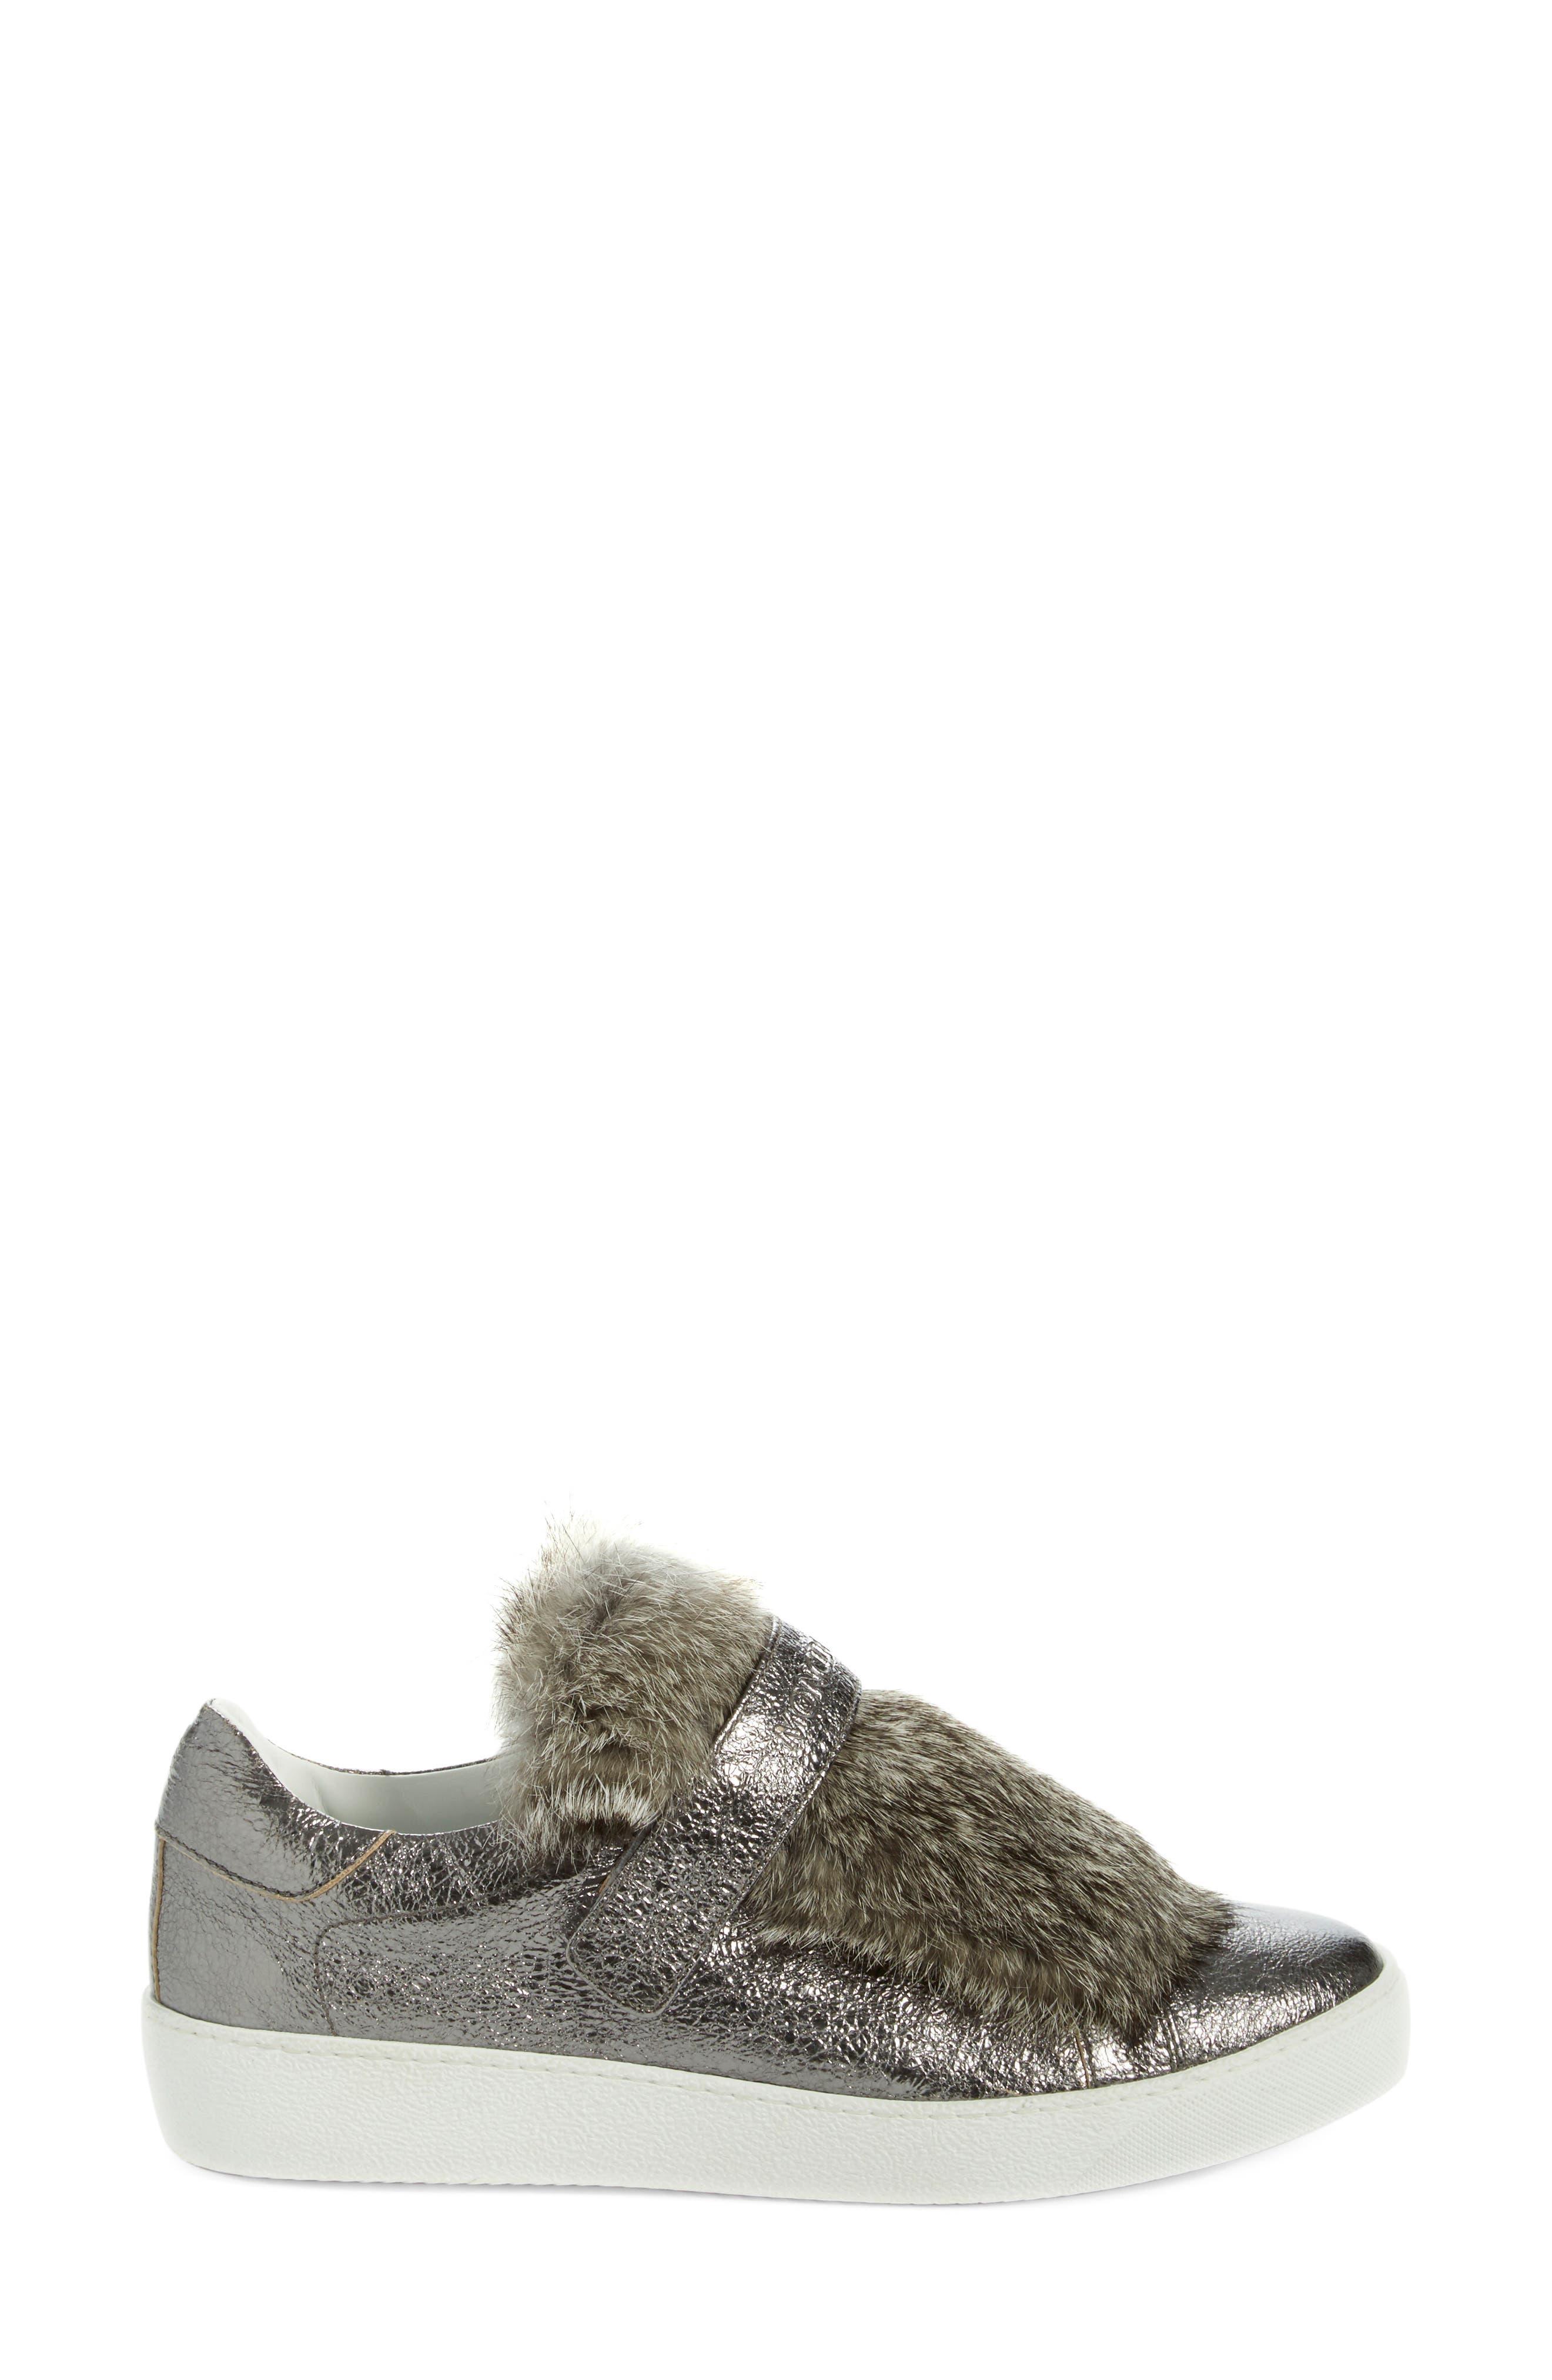 MONCLER, 'Lucie Scarpa' Genuine Rabbit Fur Trim Sneaker, Alternate thumbnail 4, color, 020